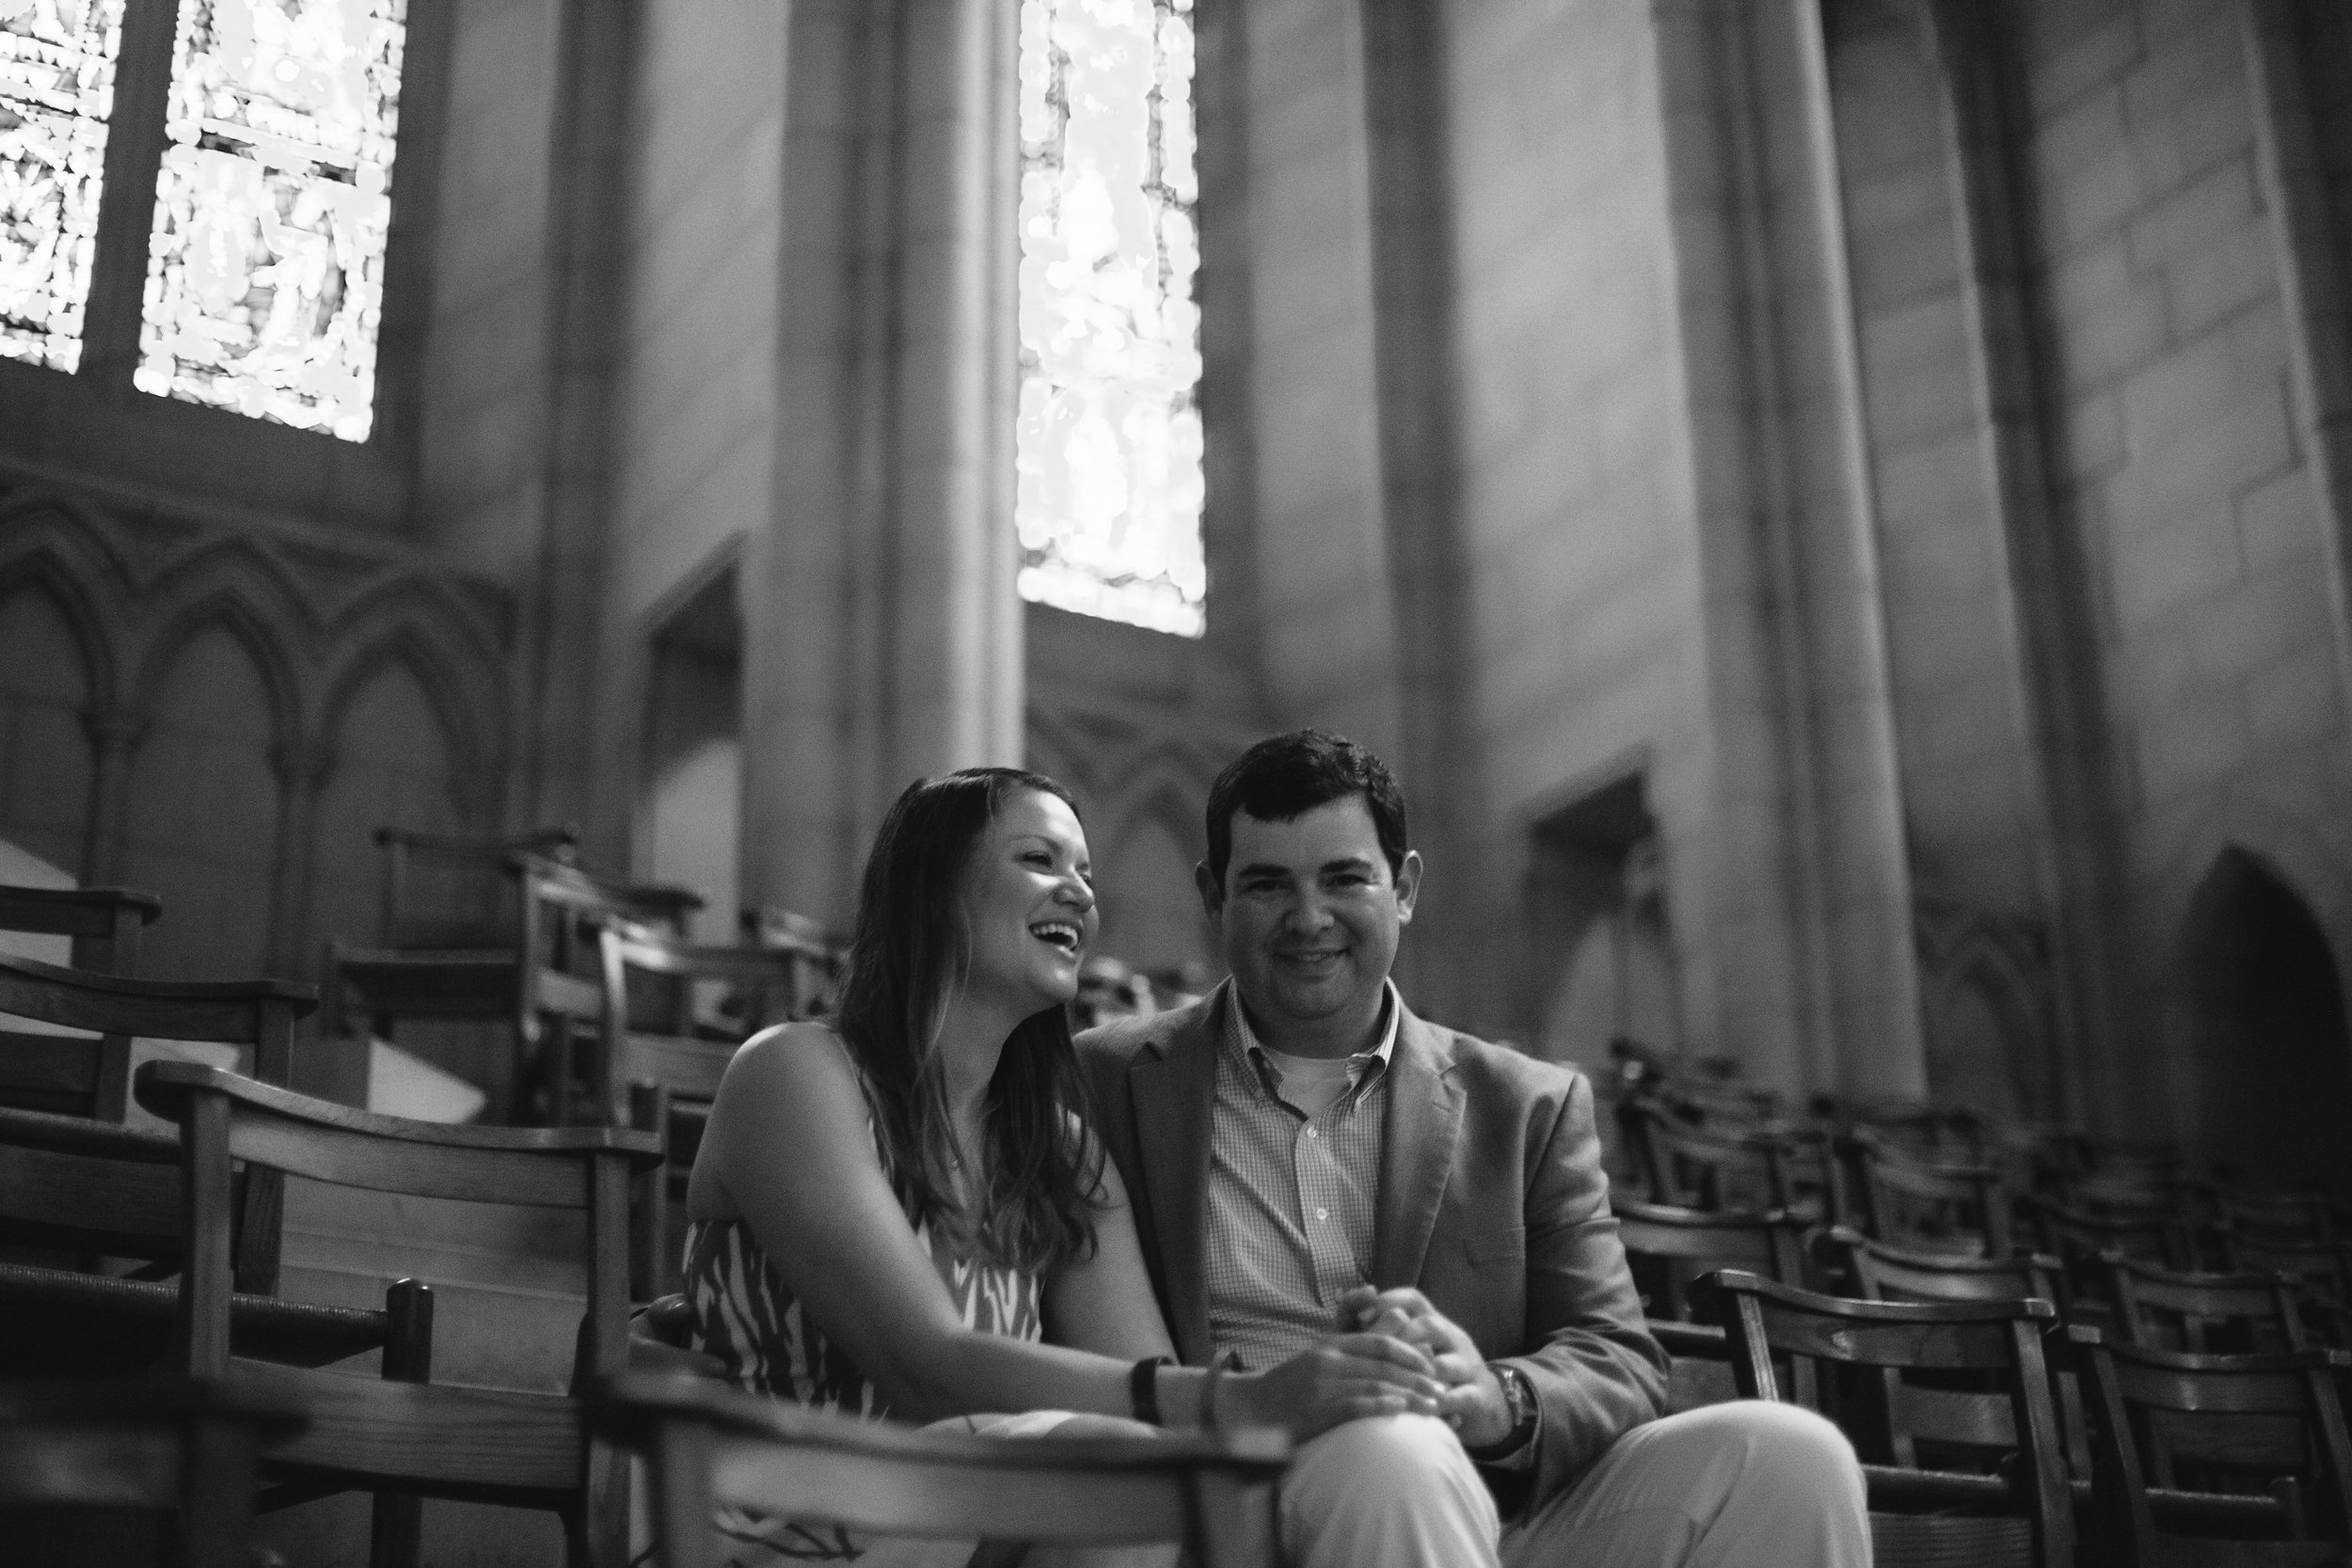 Anna & Nat (Washington, D.C.)